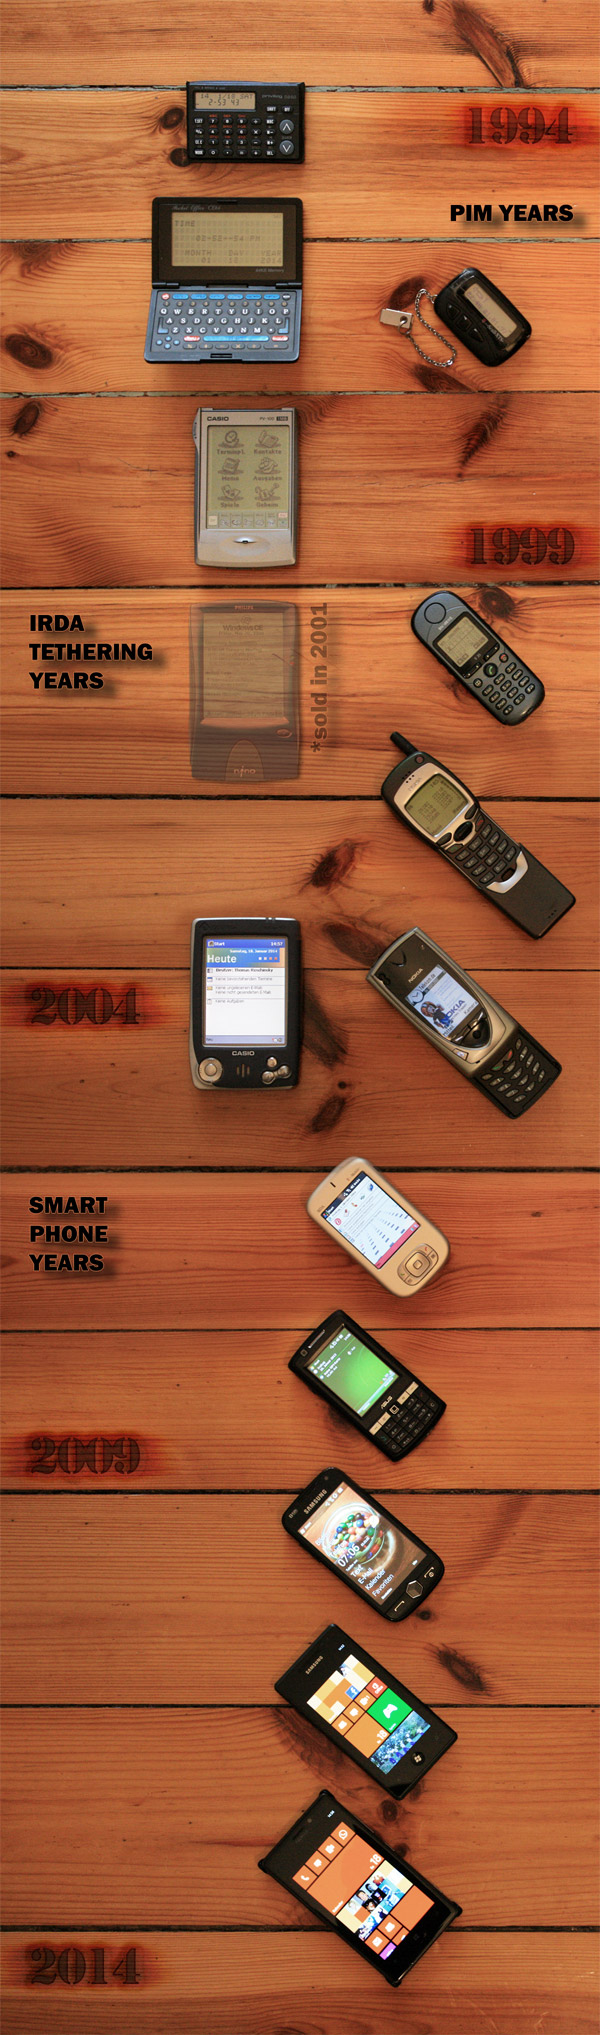 Privileg DB50; Pocket Office CE64; Scall XTS; CasioPocket Viewer PV-100; Philips Nino 210; Siemens S35; Nokia 7110; Casio EM 500G; Nokia7650; HTC PM10A (MDA compact); Asus P750; Samsung Omnia II; Samsung Omnia 7; NokiaLumia 925